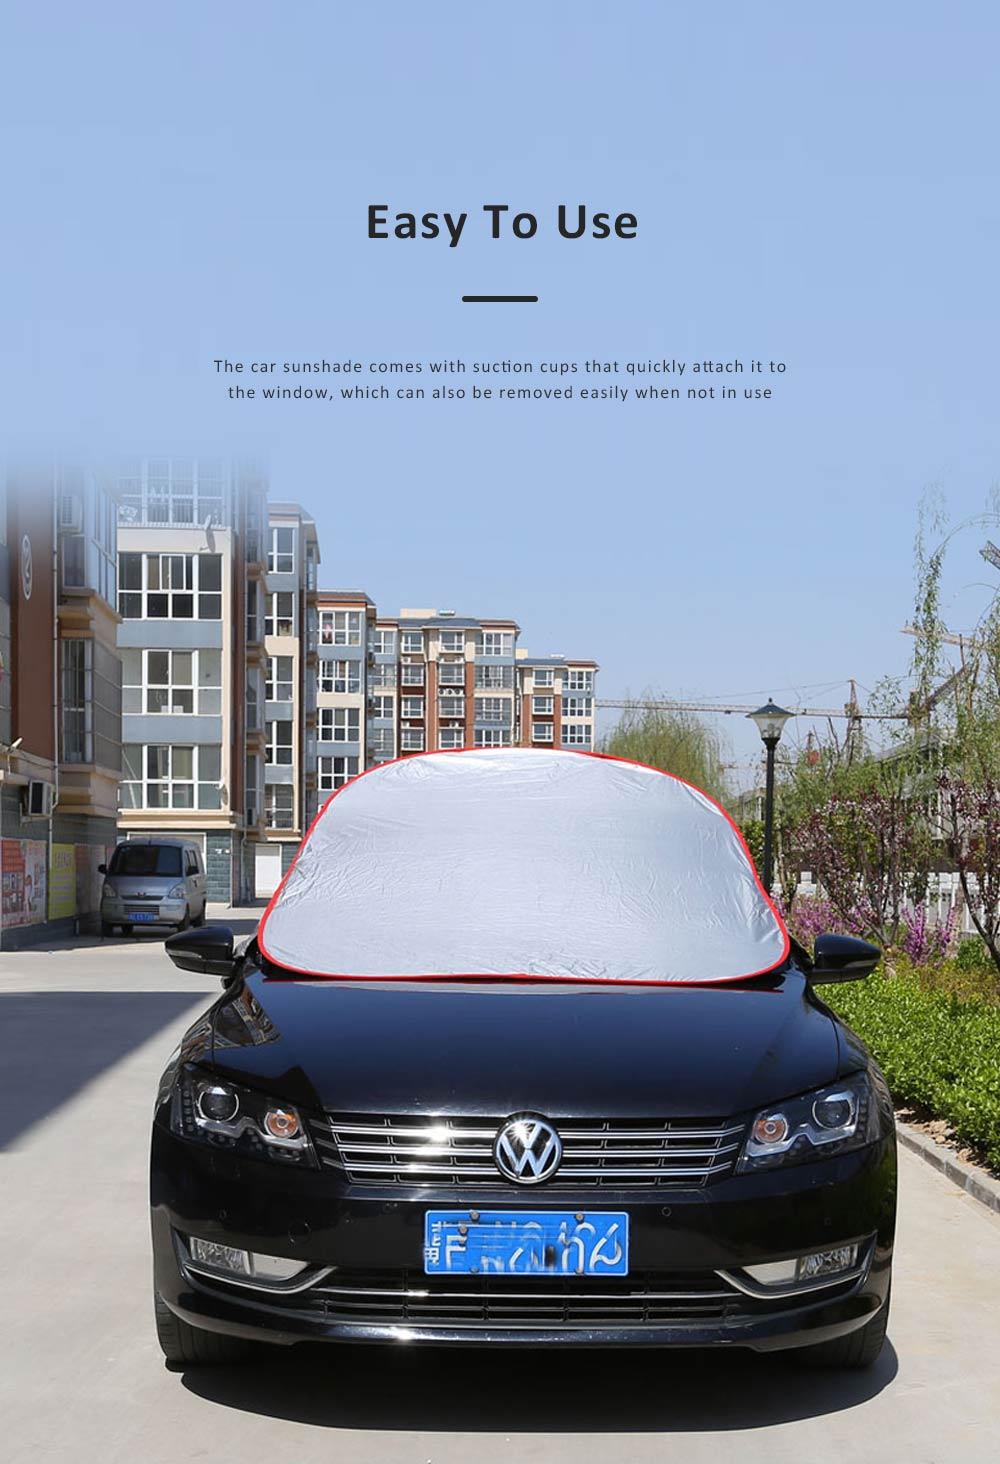 Universal Car Sunshade UV Ray Protector Cooler Umbrella Fabric Sunshade for Cars 4